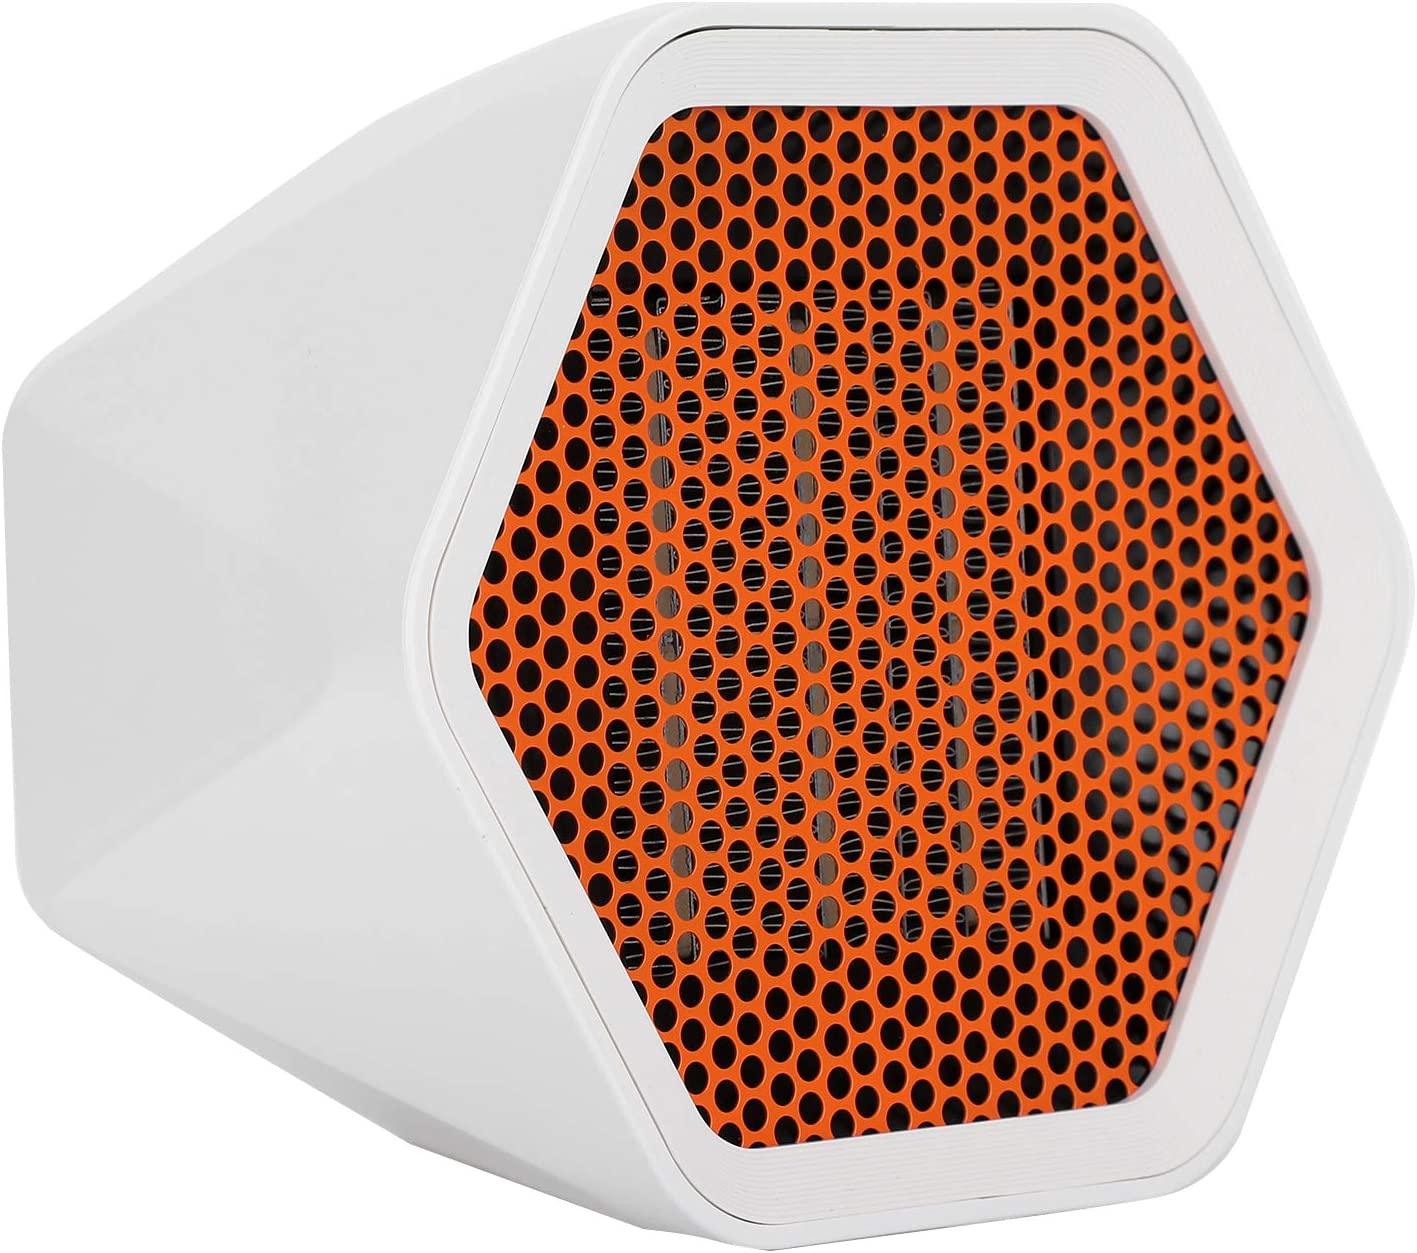 Dpofirs 1000W Mini Powerful Desktop Home Heater, Noiseless Electric Fan Heater for Winter, 3 Seconds Fast Heat Up, Personal Space Ceramic Heater(1000W)